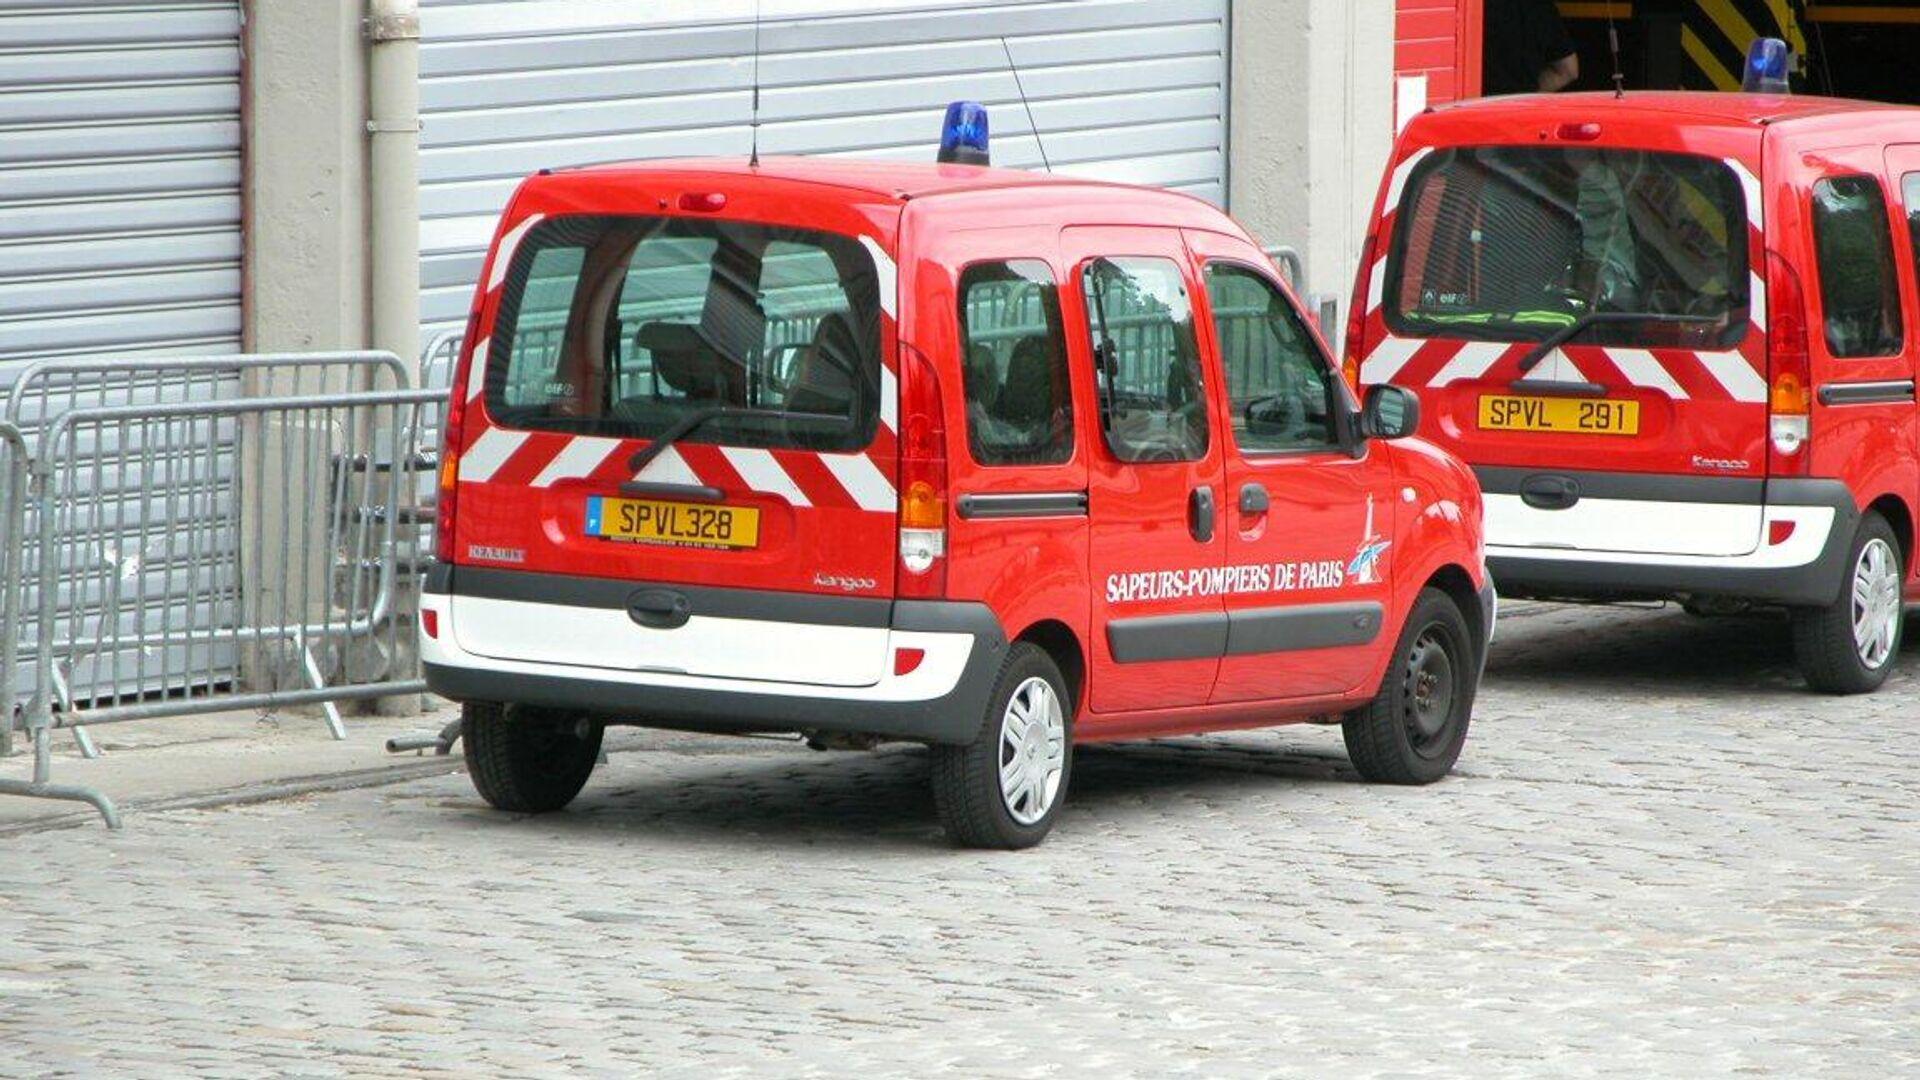 Feuerwehr in Paris (Archivbild) - SNA, 1920, 26.09.2021